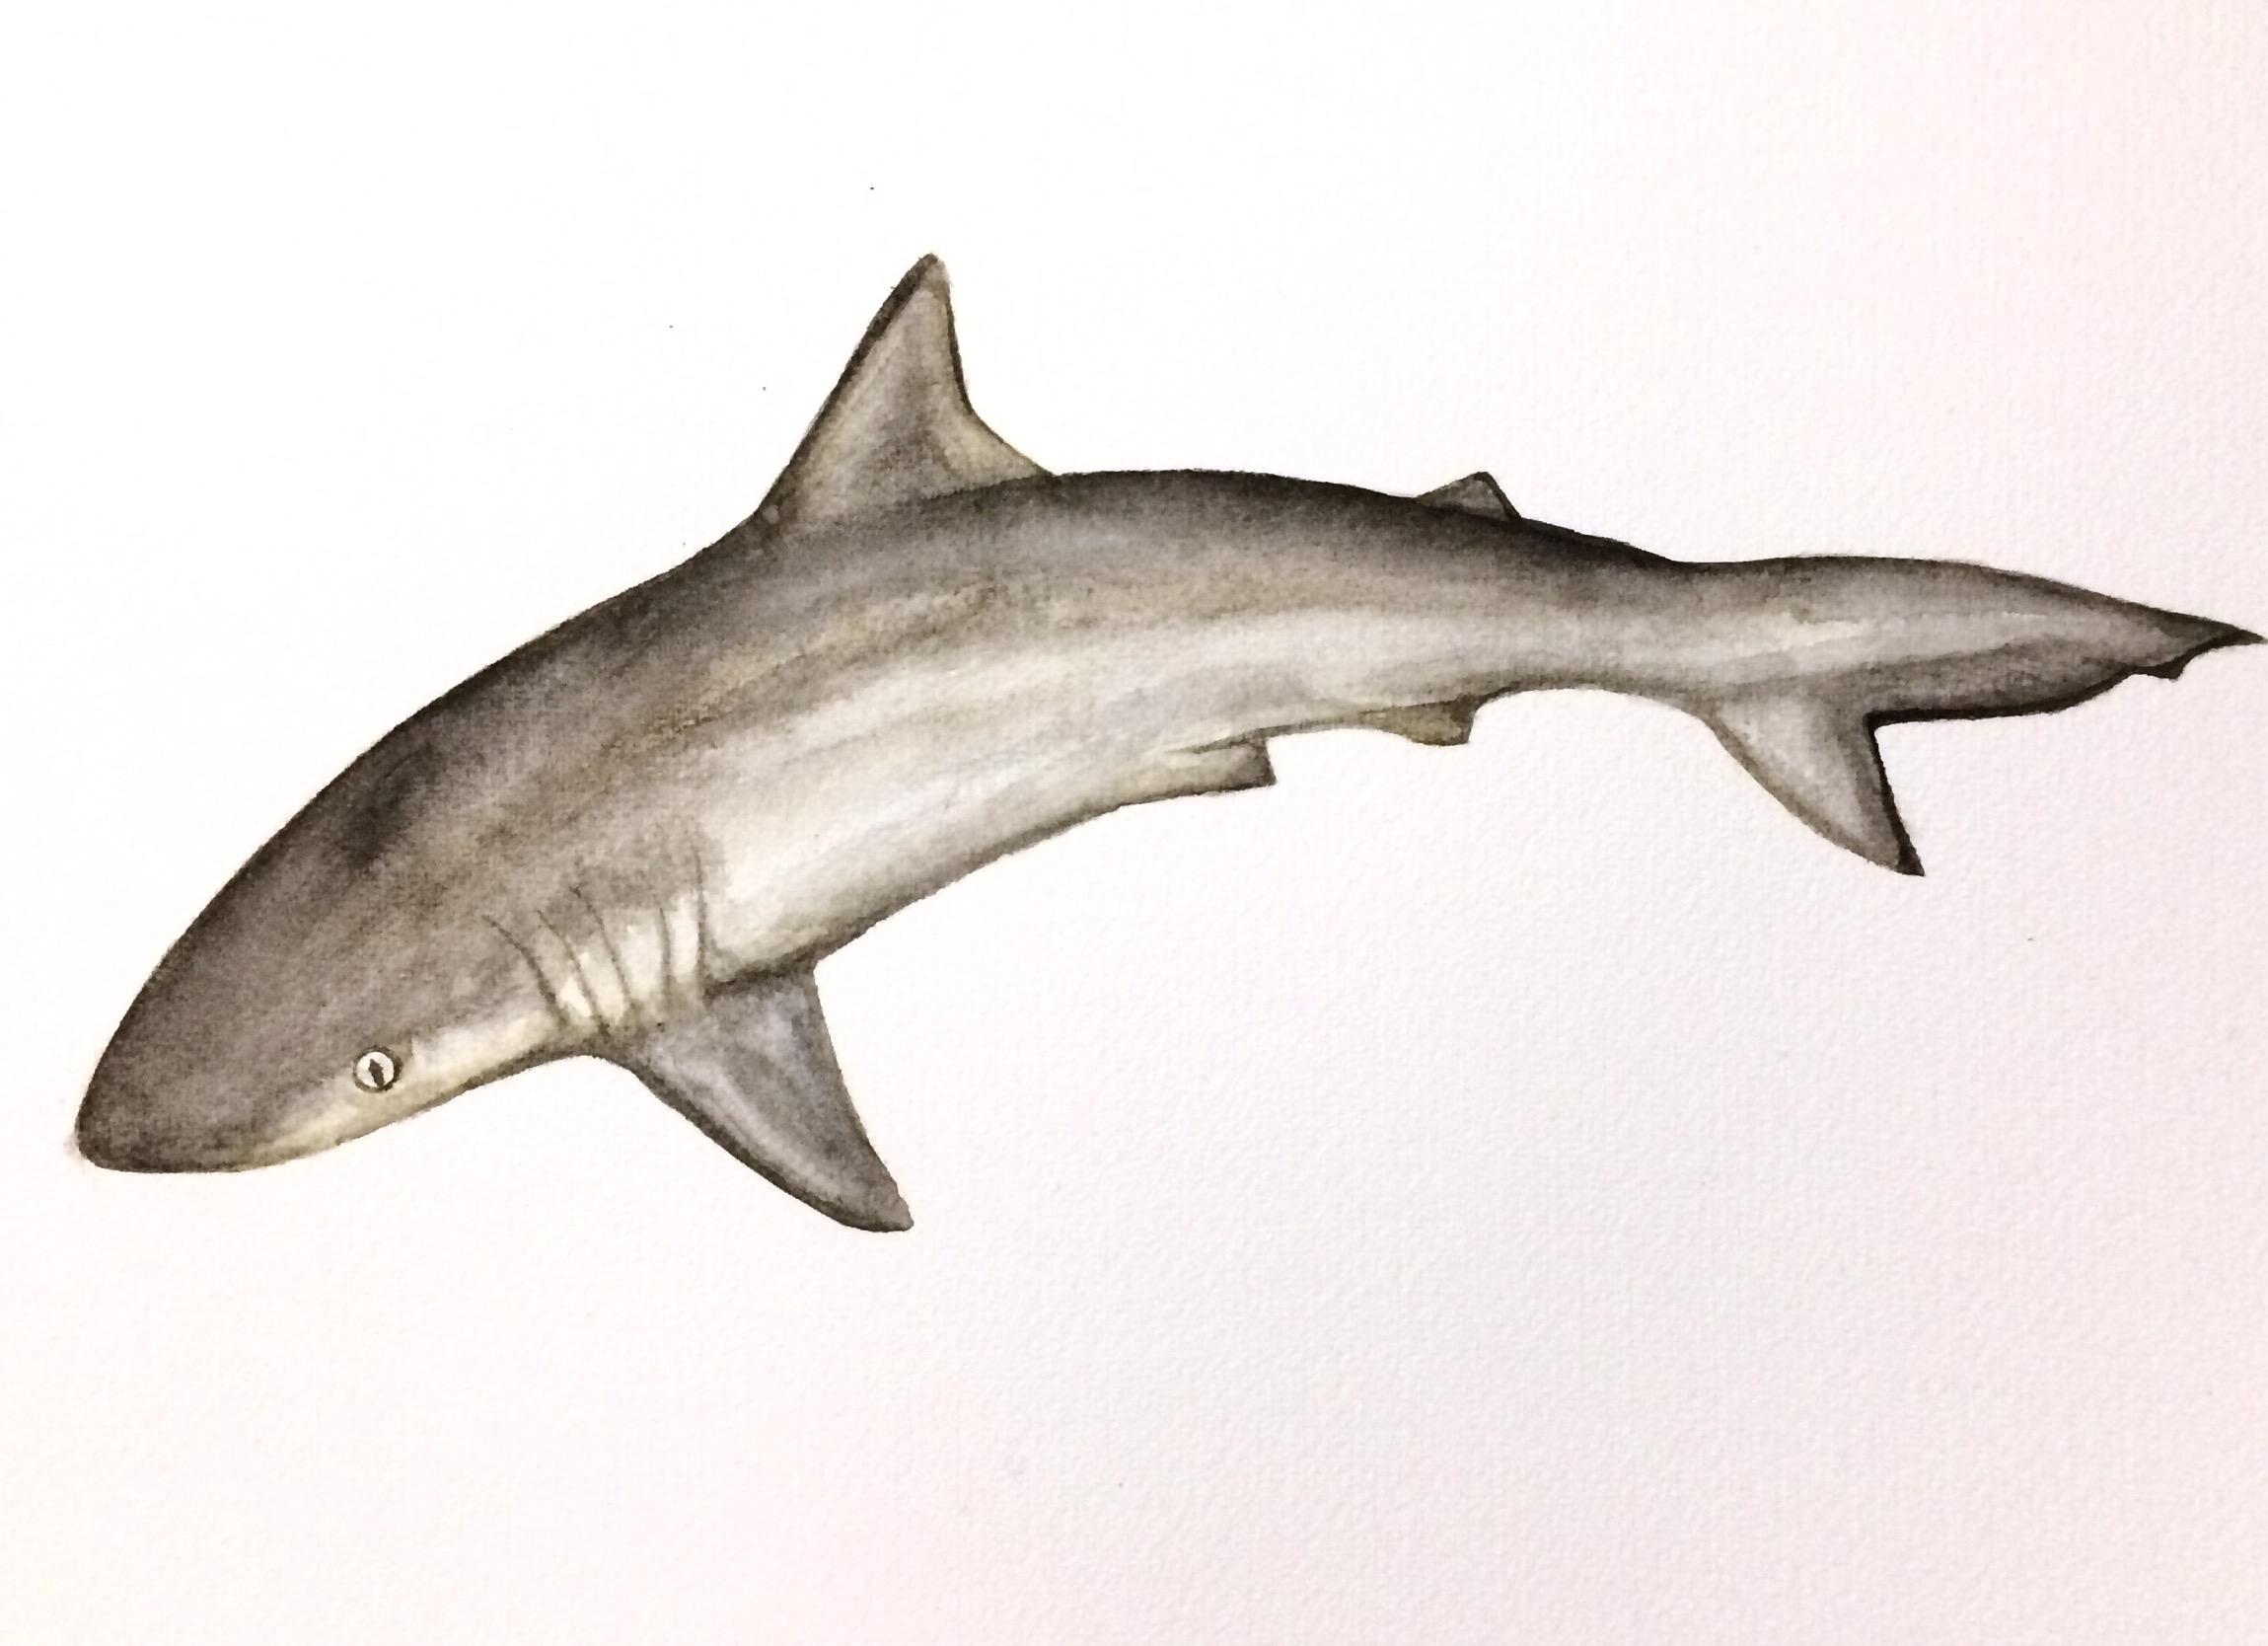 31/365 Atlantic Sharpnose Shark